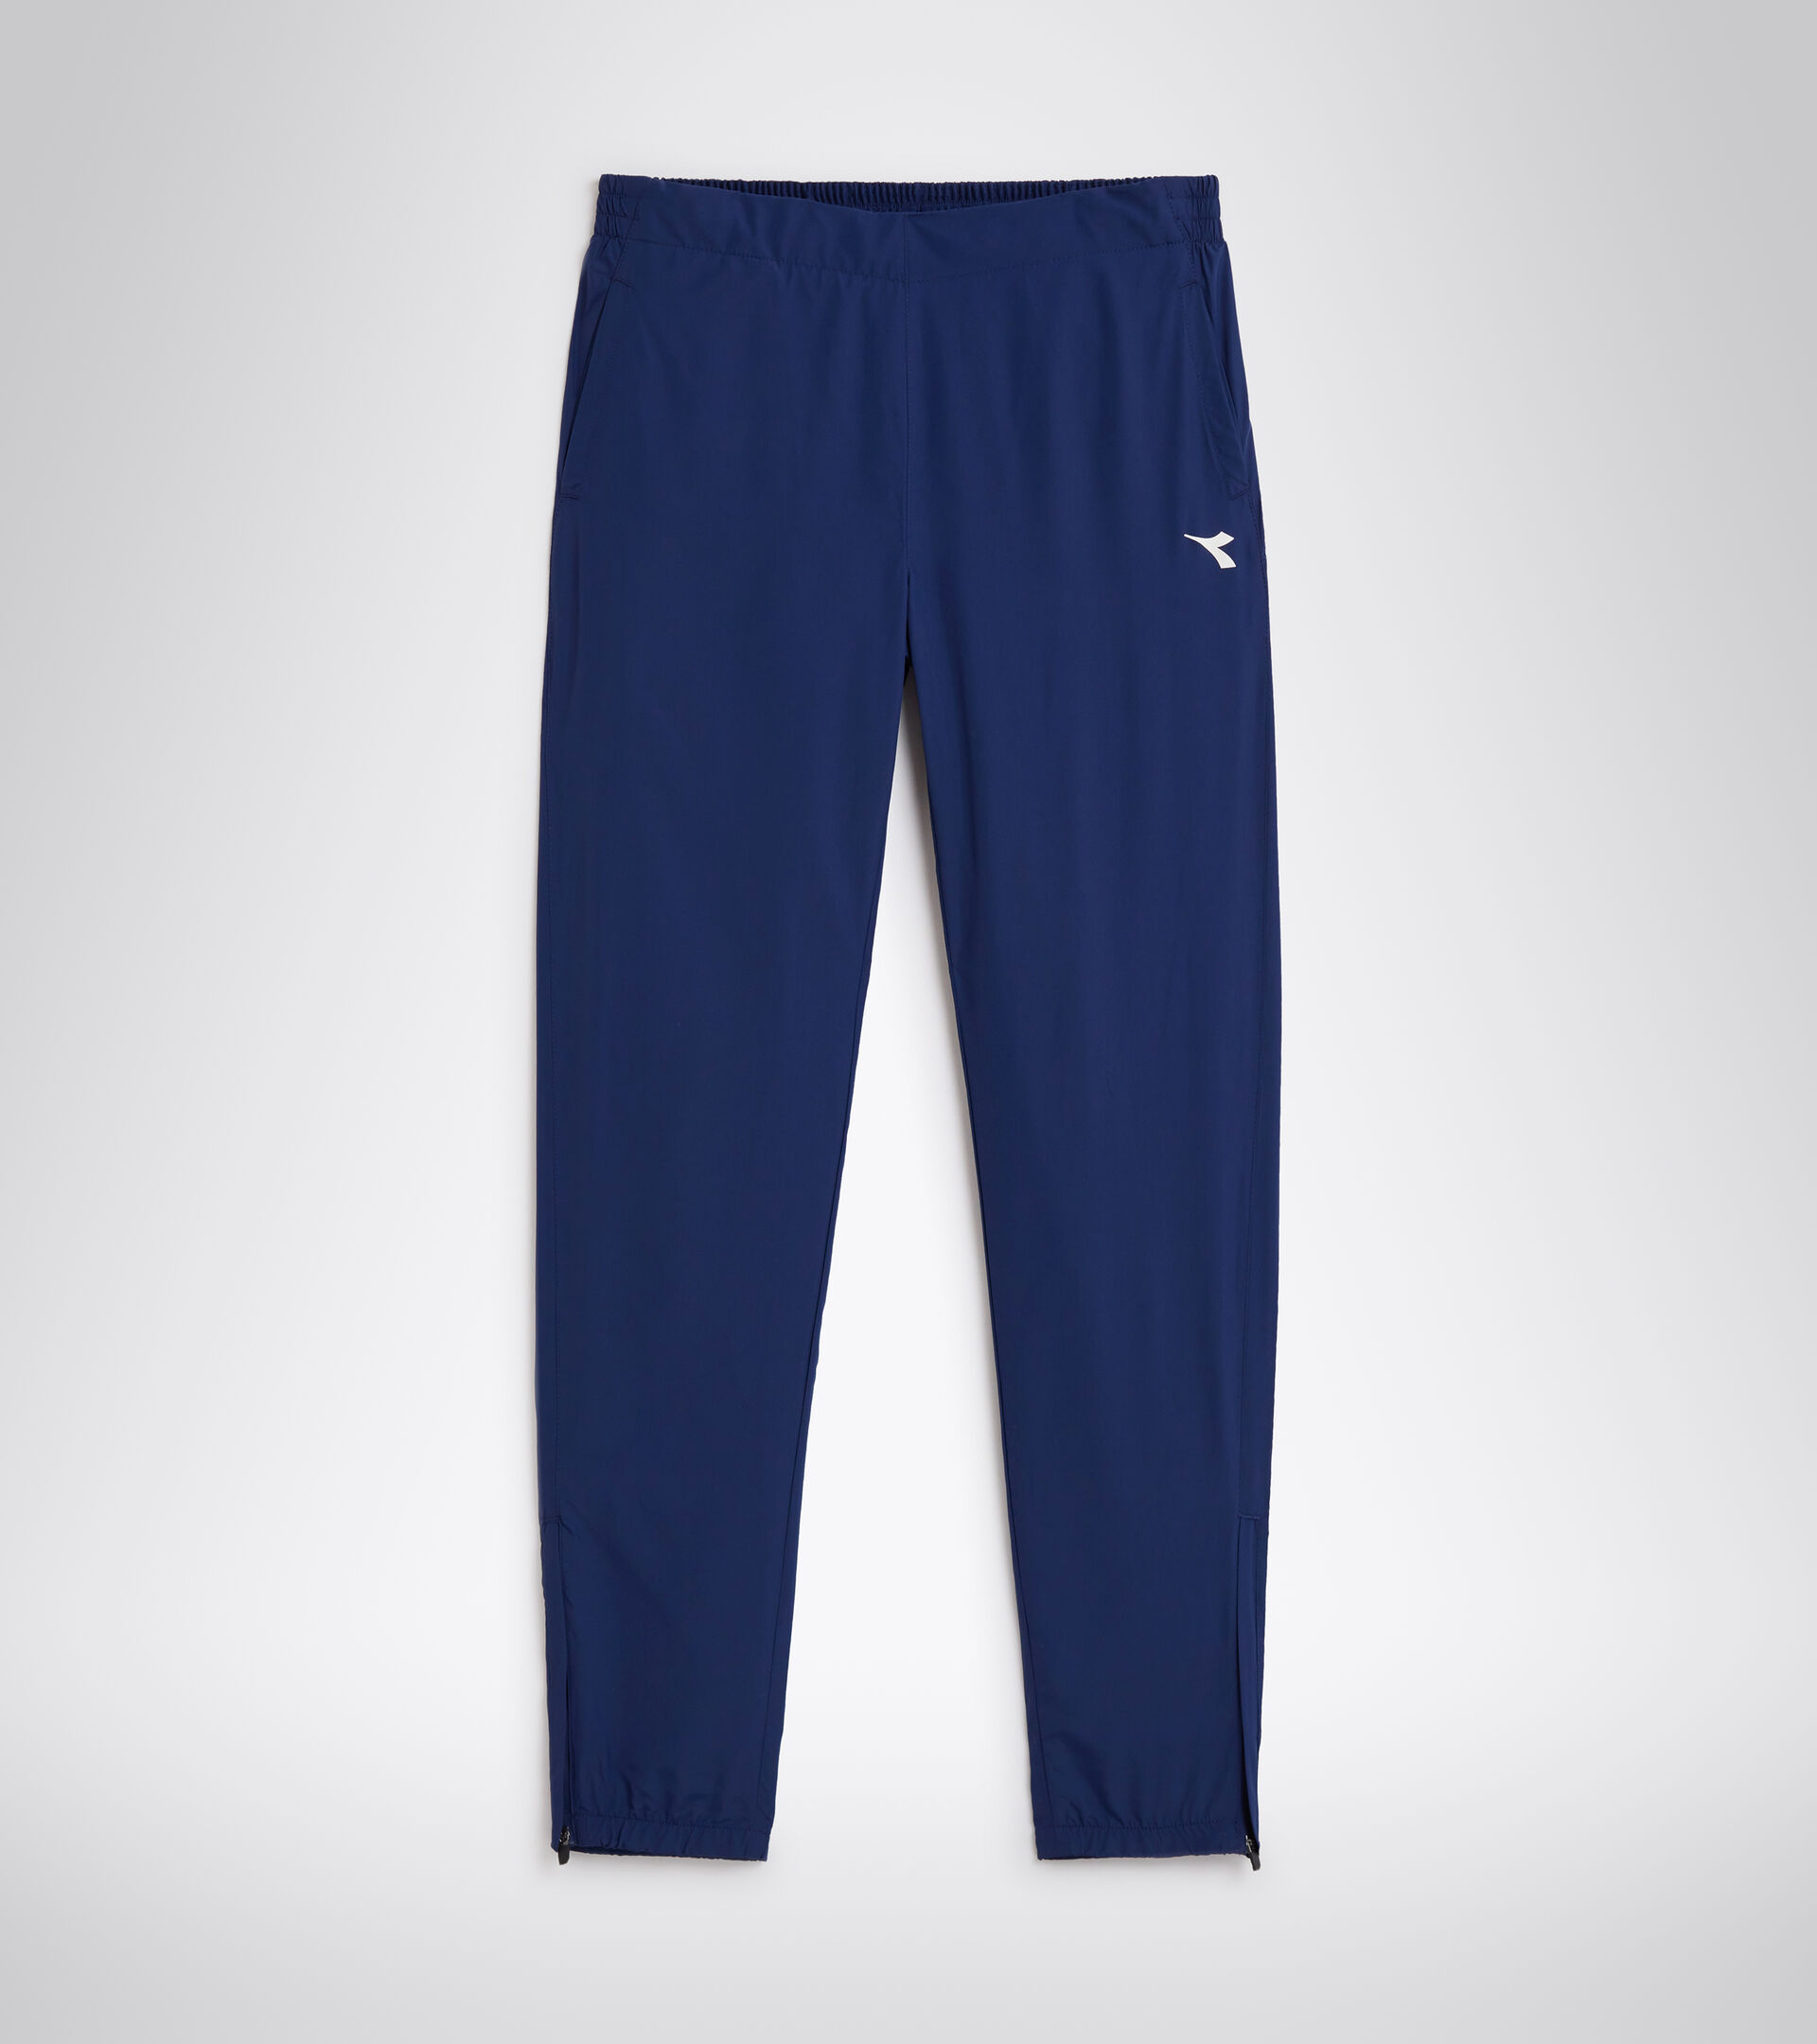 Tennis trousers - Women L. PANT COURT SALTIRE NAVY - Diadora